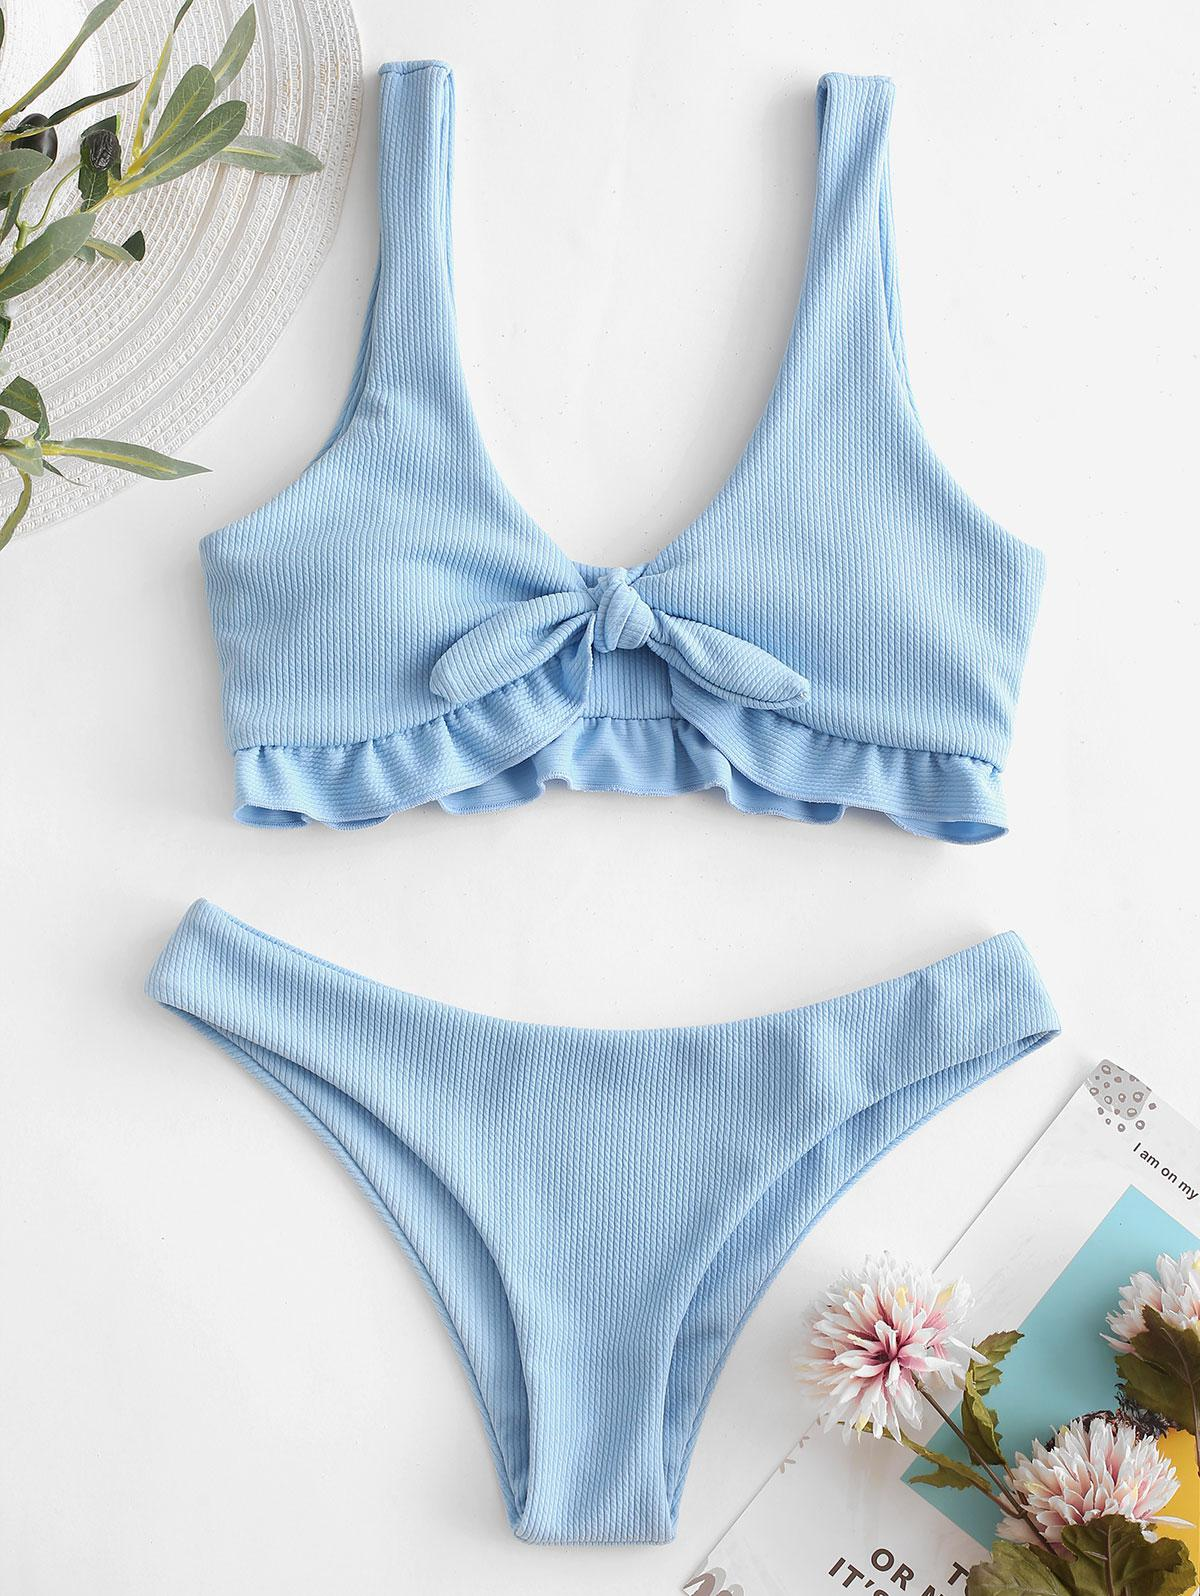 ZAFUL Ribbed Ruffle Tied Bikini Swimsuit, Jeans blue